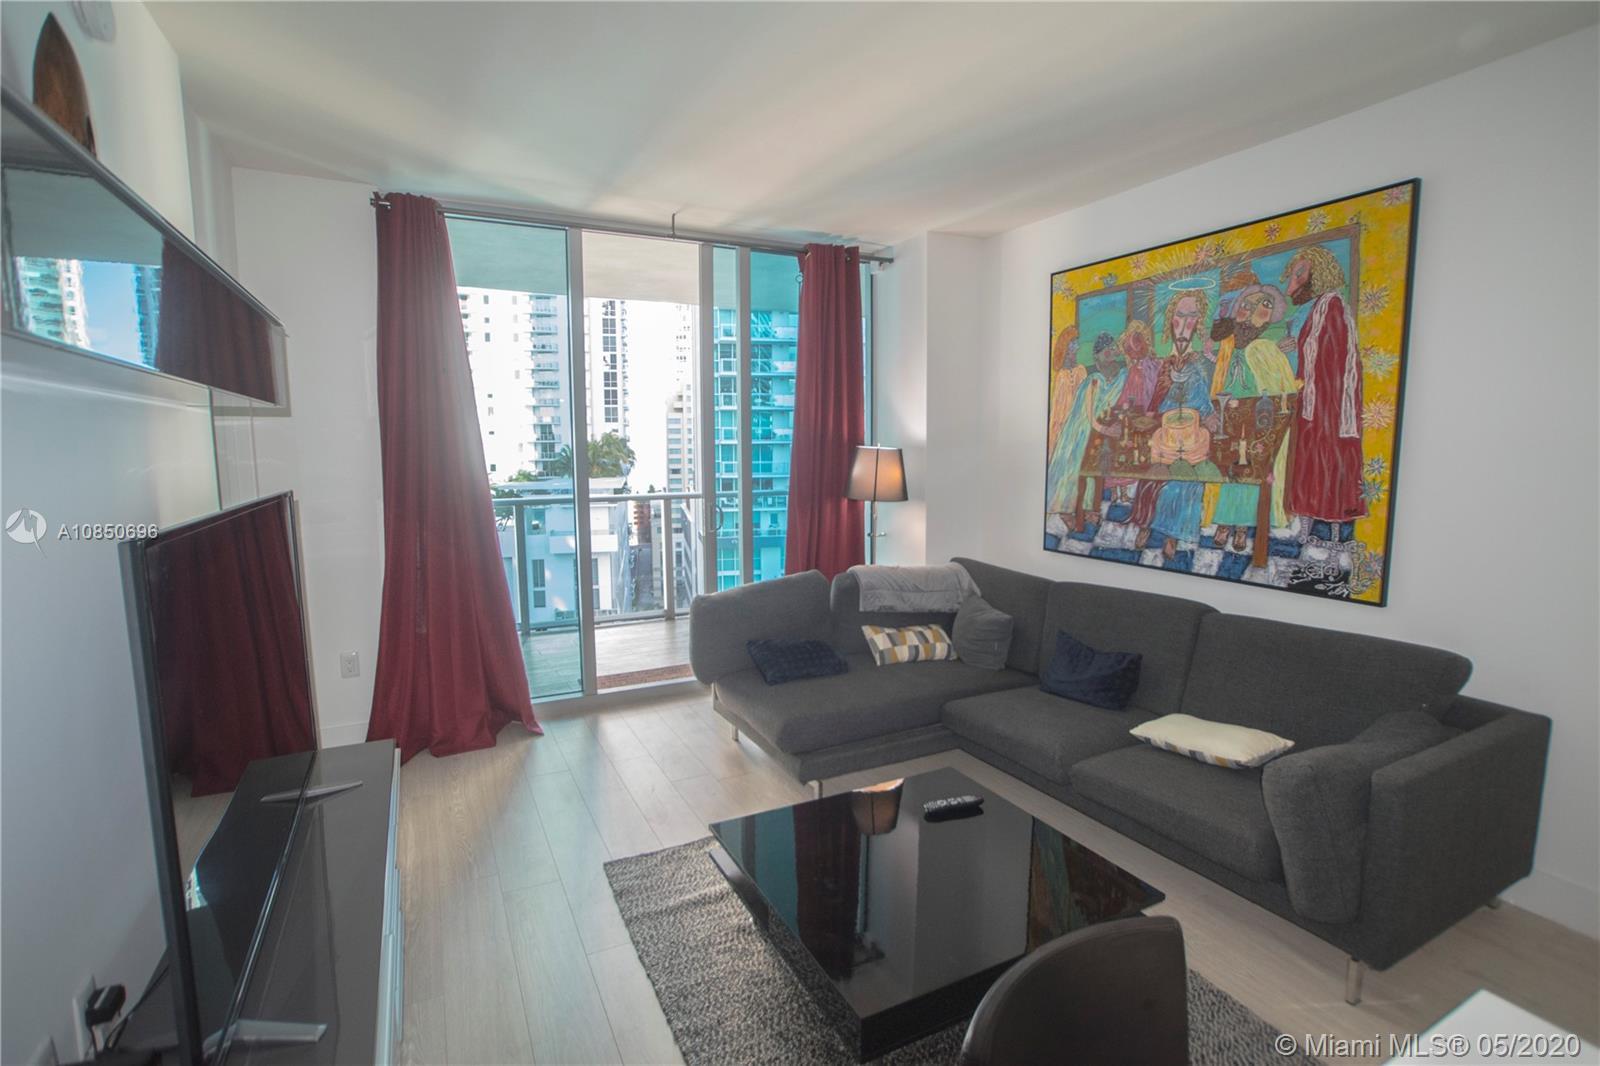 1100 Millecento #1511 - 1100 S Miami Ave #1511, Miami, FL 33130